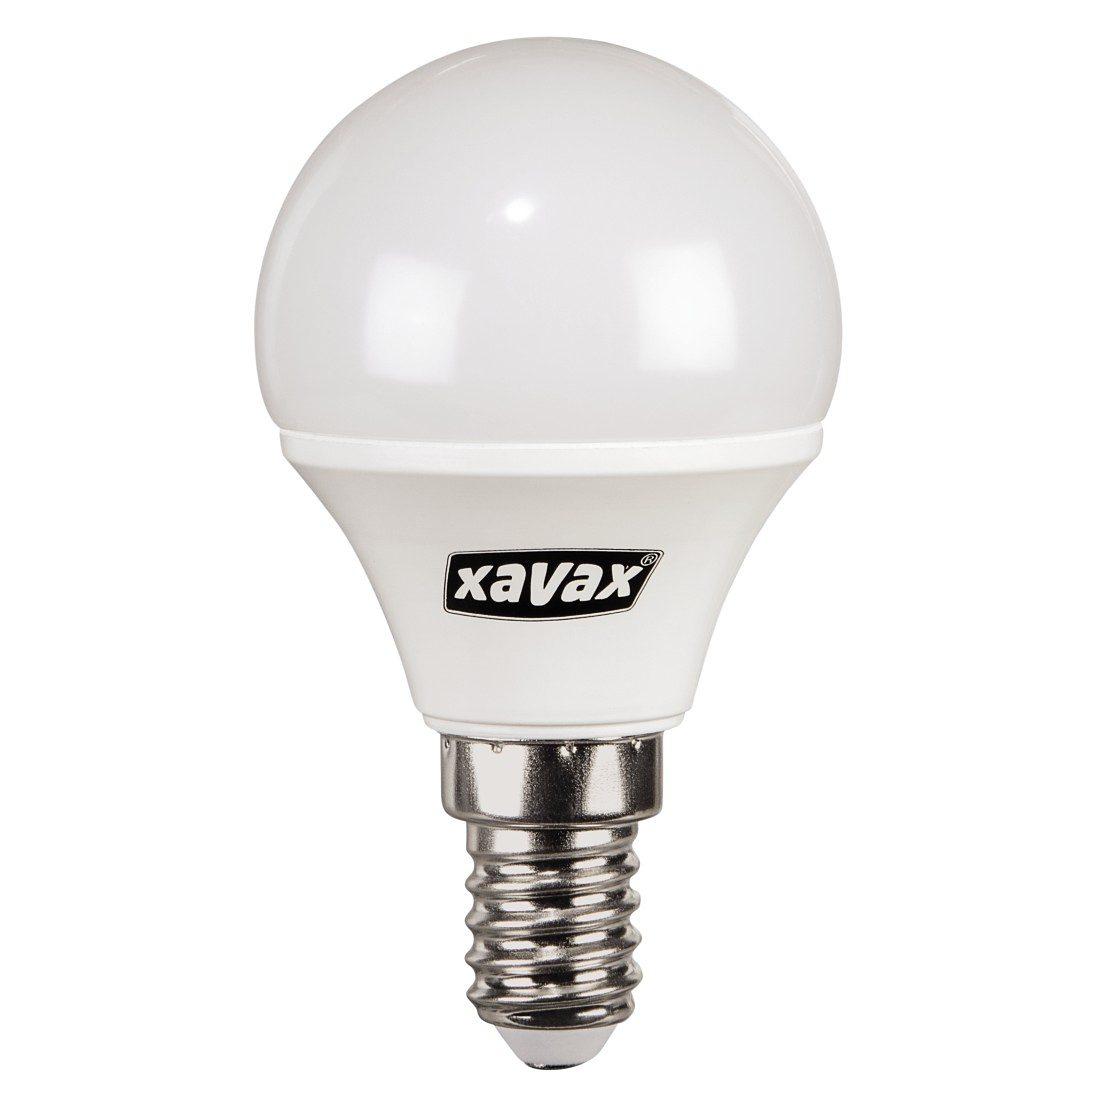 Xavax LED-Lampe, 4W, Tropfenform, E14, Warmweiß